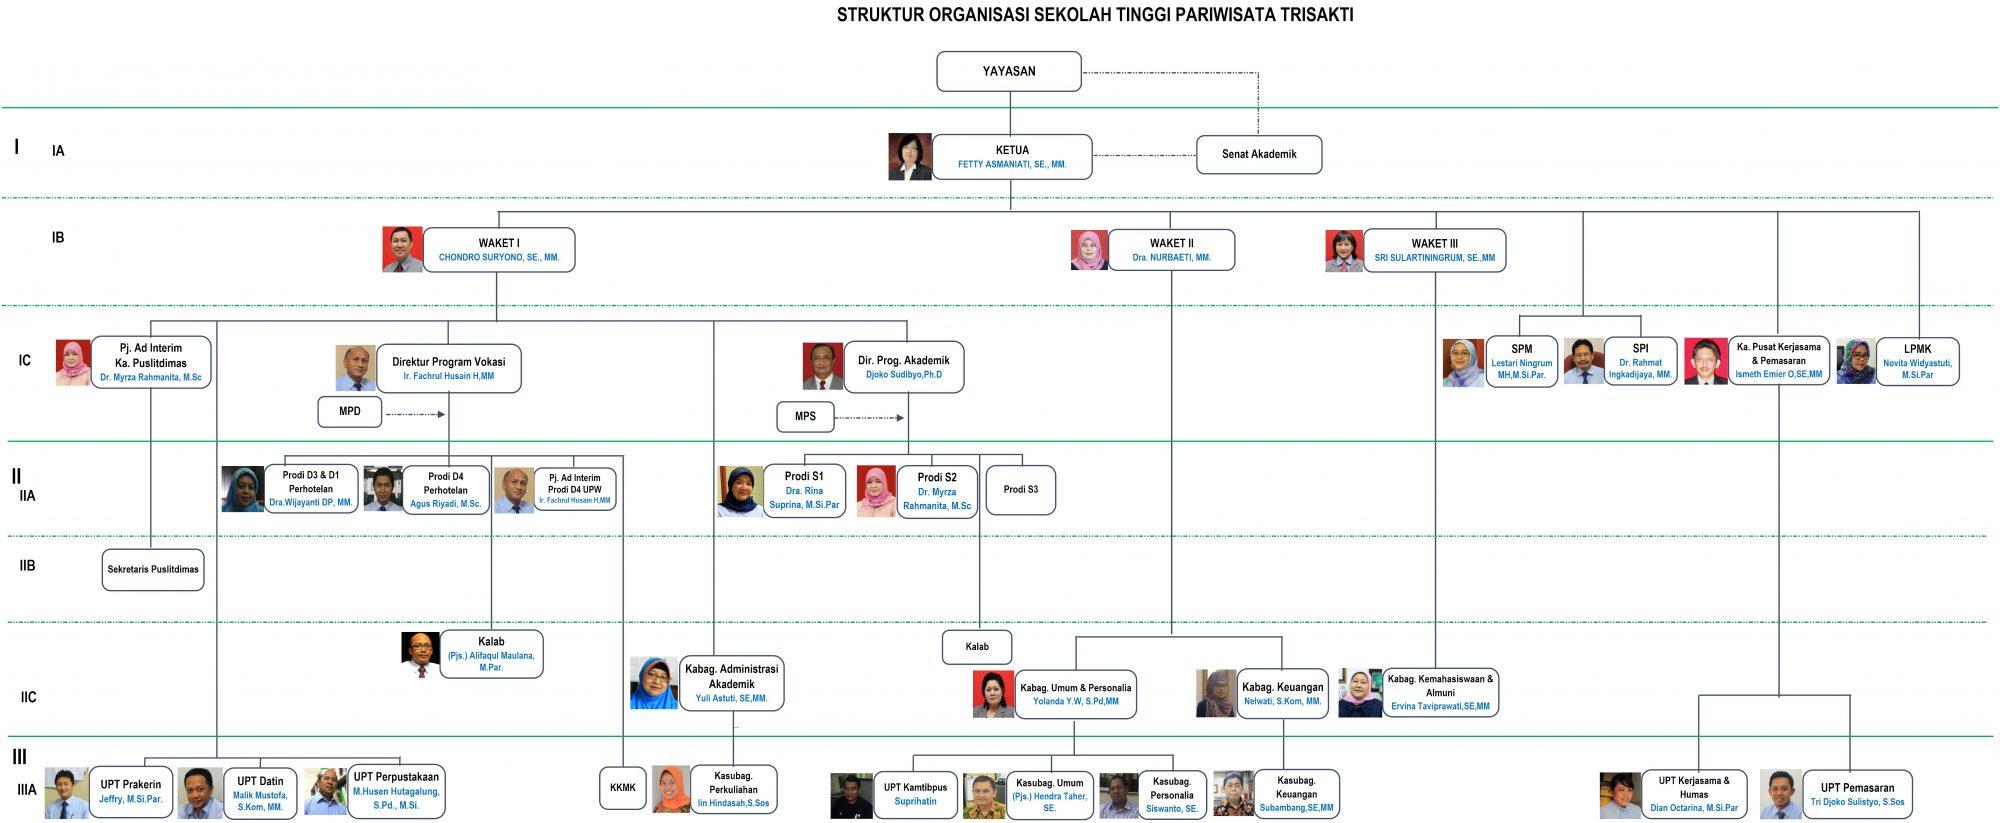 foto Struktur Organisasi STP Trisakti Statuta 2014--(30-05-2016)1